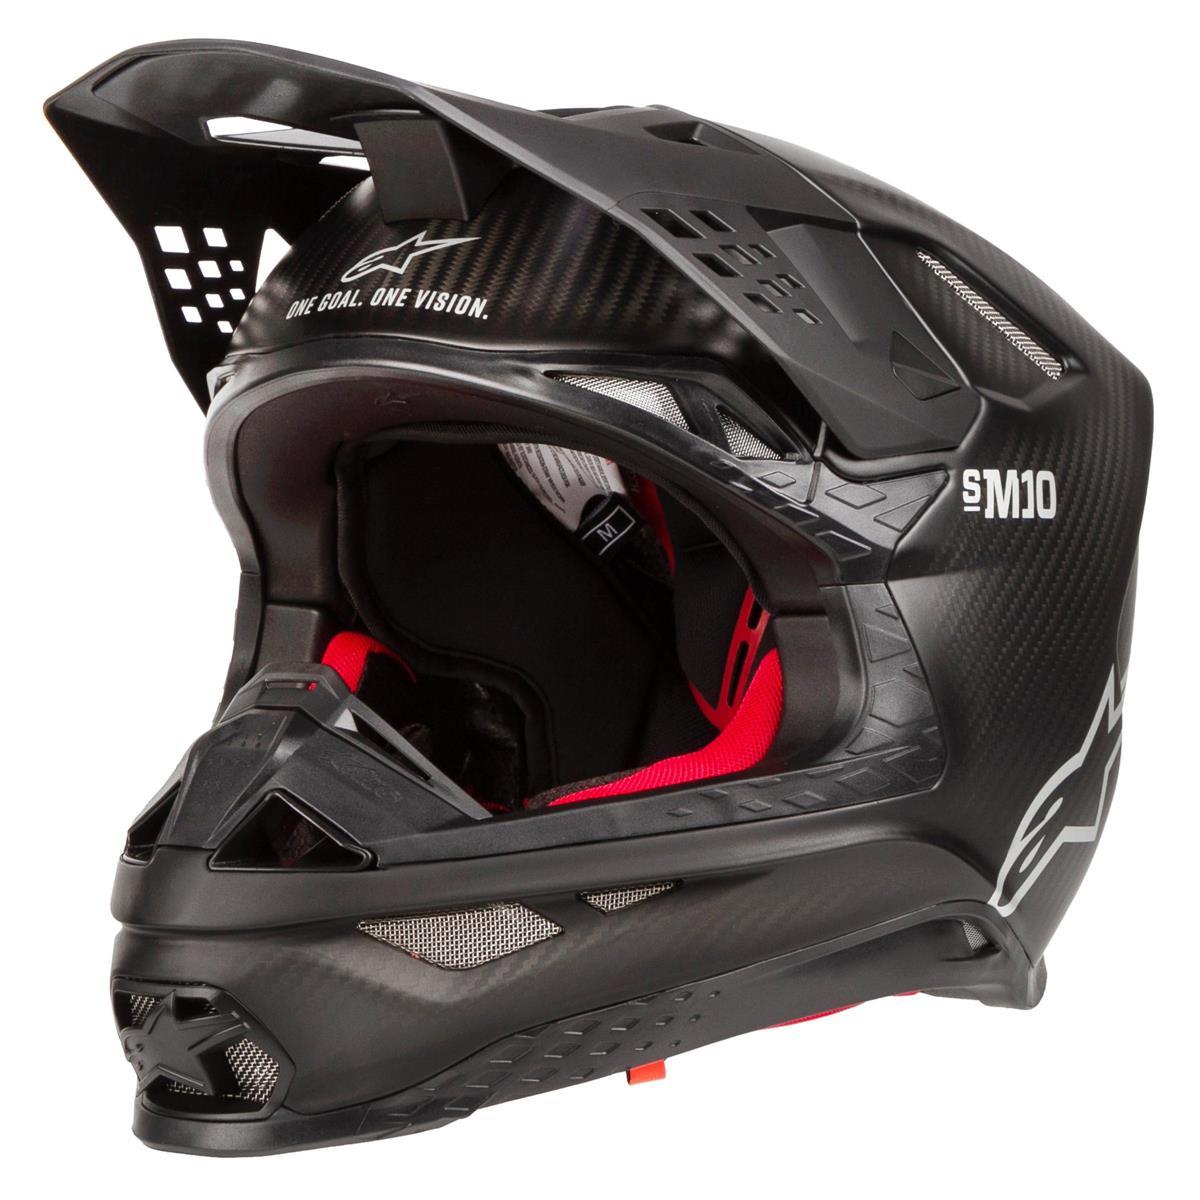 alpinestars-helm-helmet-supertech-s-m10-1 (3)